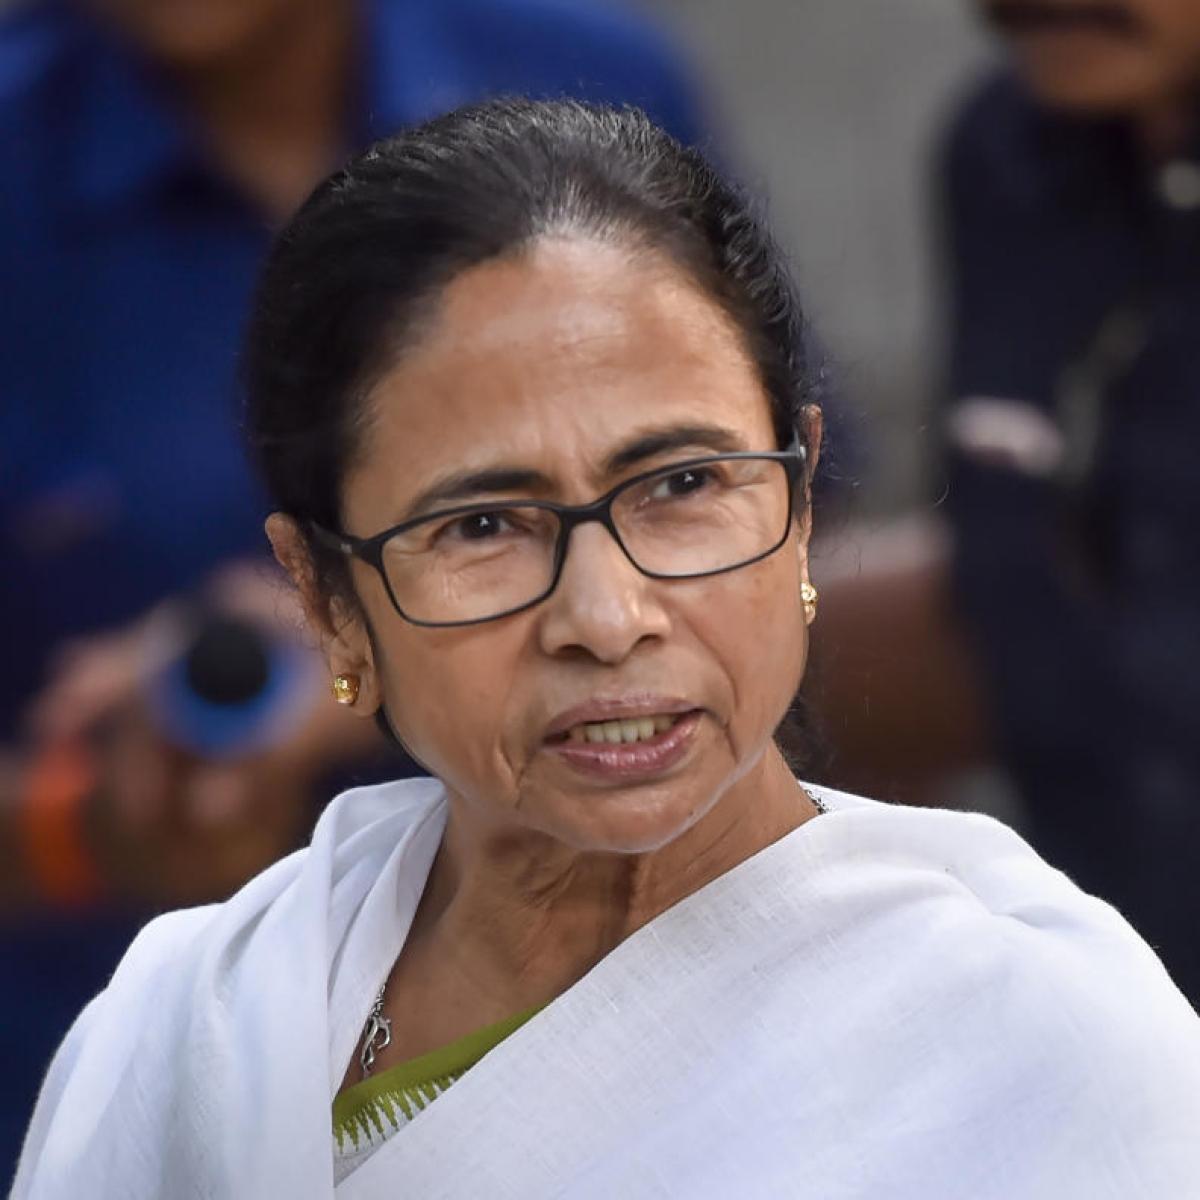 West Bengal Exit Poll: Mamata Banerjee's TMC ahead but BJP too close for comfort